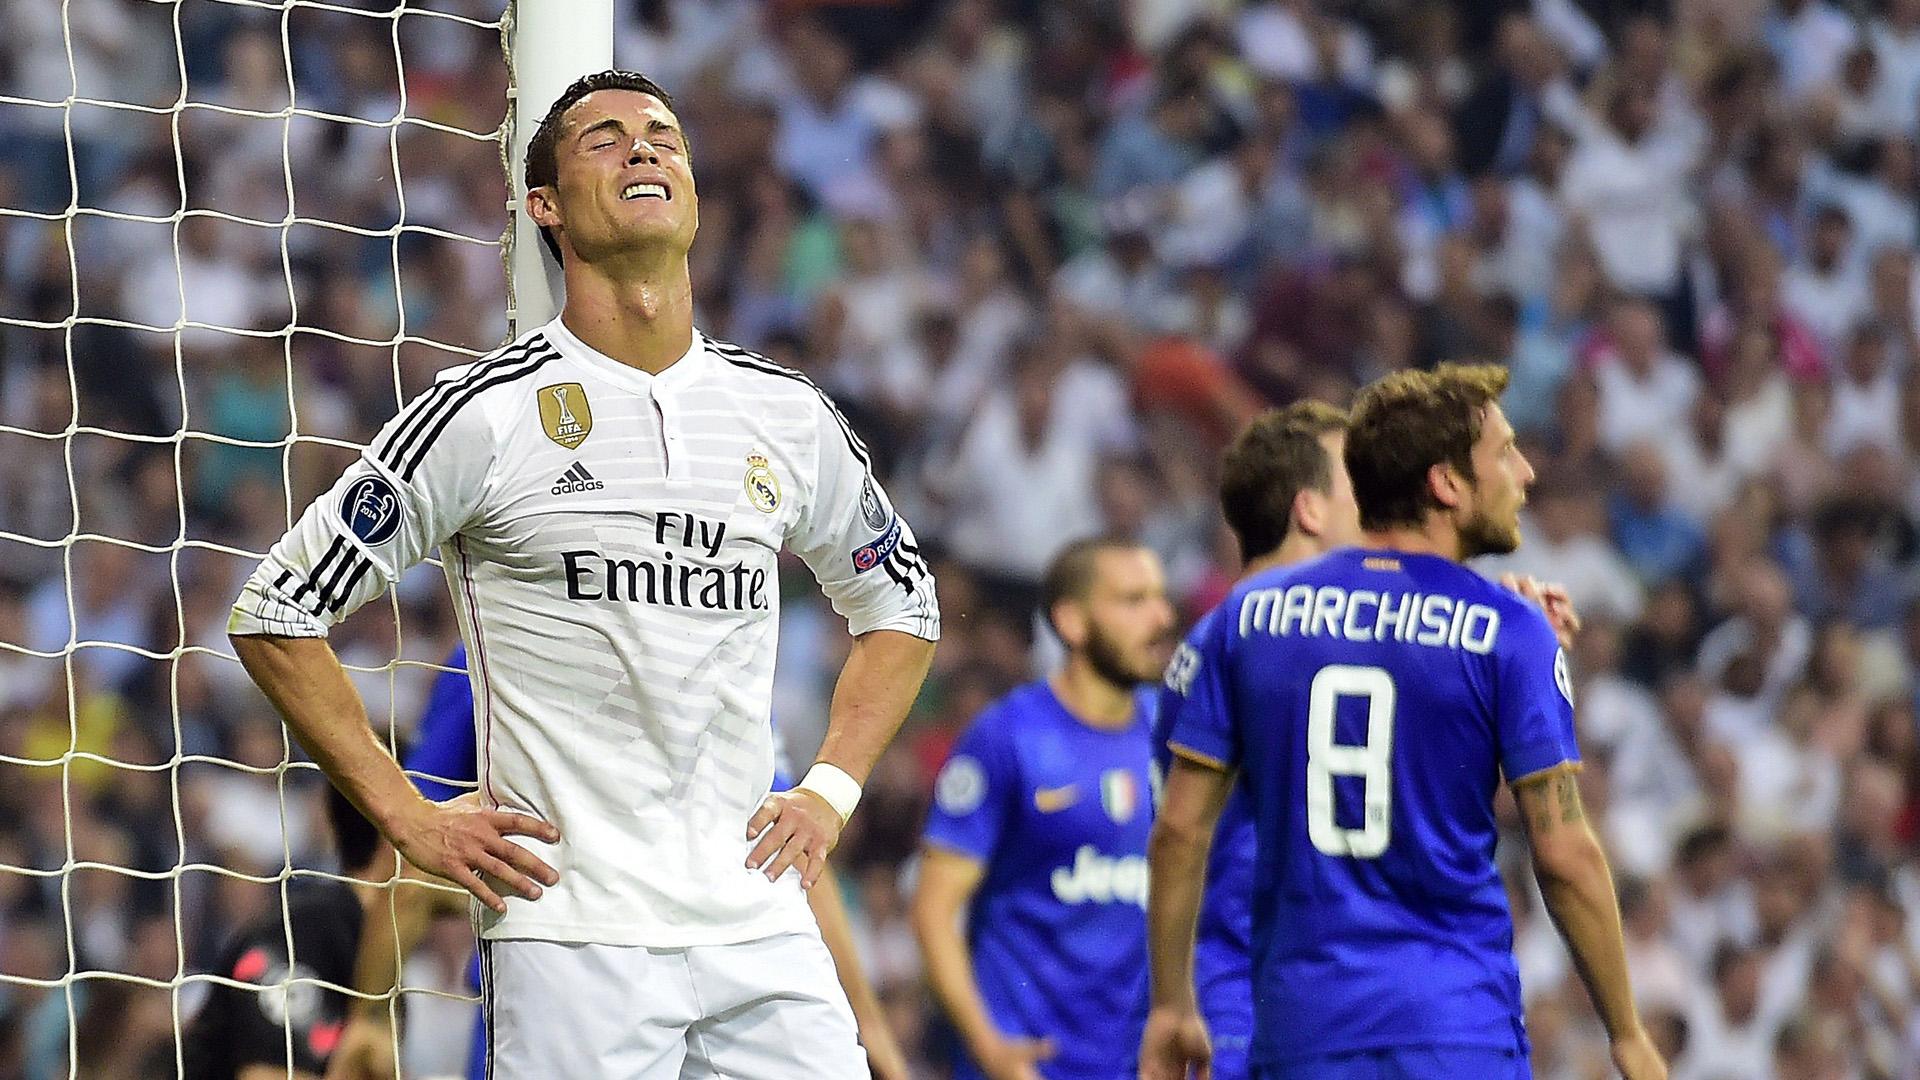 Cristiano Ronaldo Real Madrid Juventus Champions League 13052015